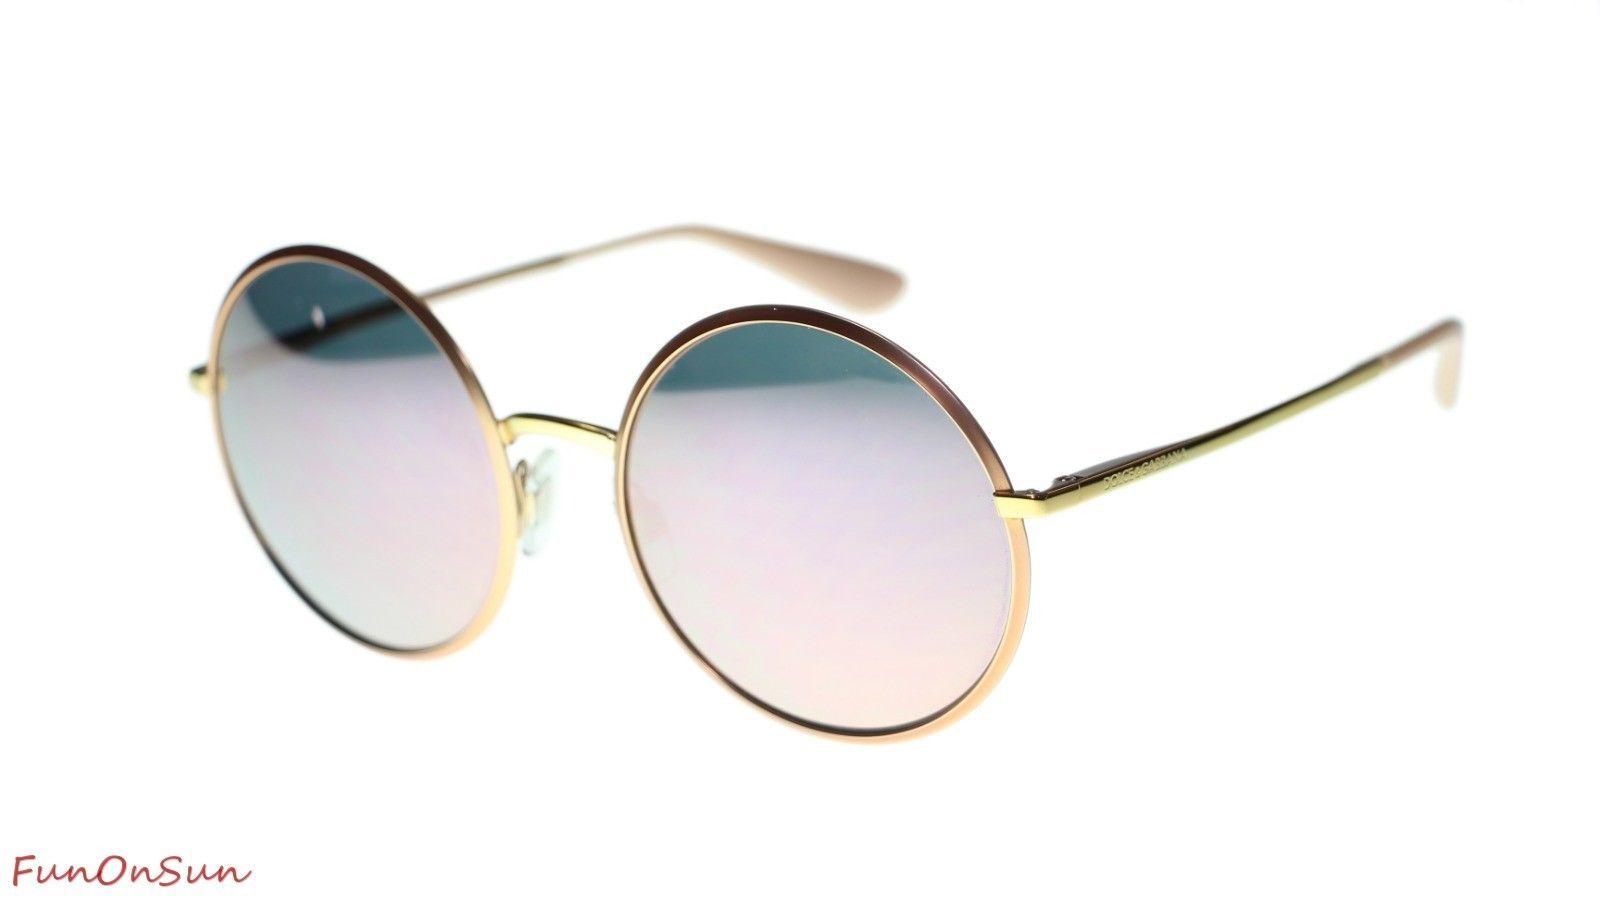 775e9f9adaa0 10. 10. Previous. Dolce Gabbana Women Sunglasses DG2155 12945R Pink/Grey Mirror  Pink Lens 56mm